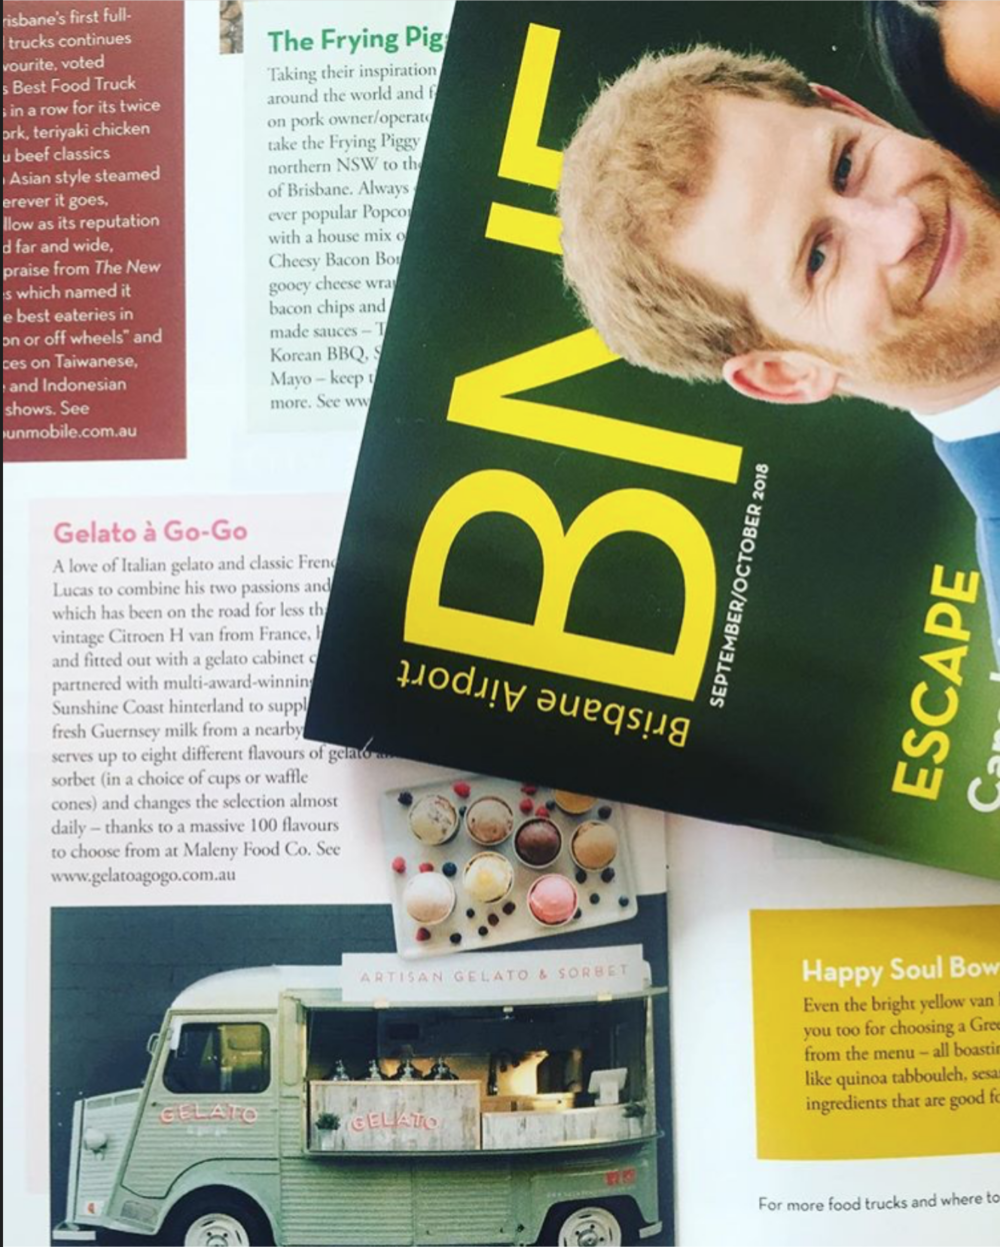 BNE Magazine Gelato a Go Go Best Food Trucks Feature